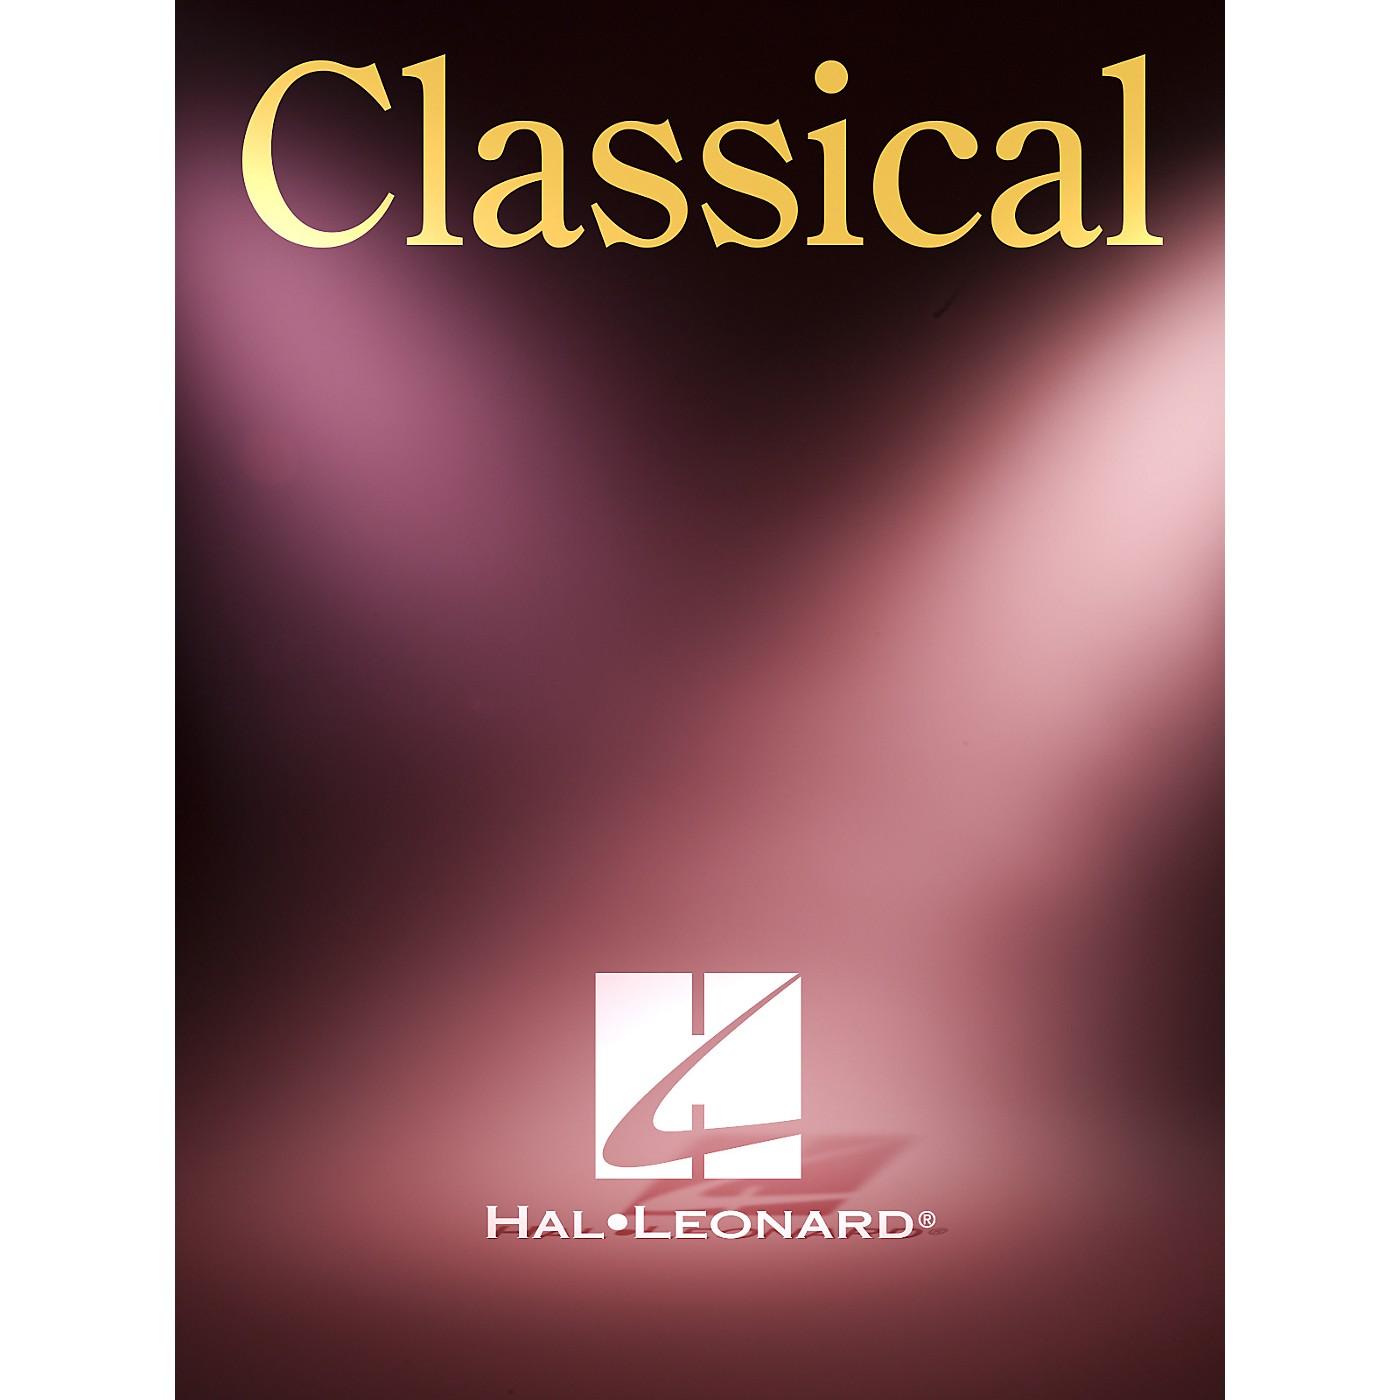 Hal Leonard Arie Musicali Suvini Zerboni Series thumbnail